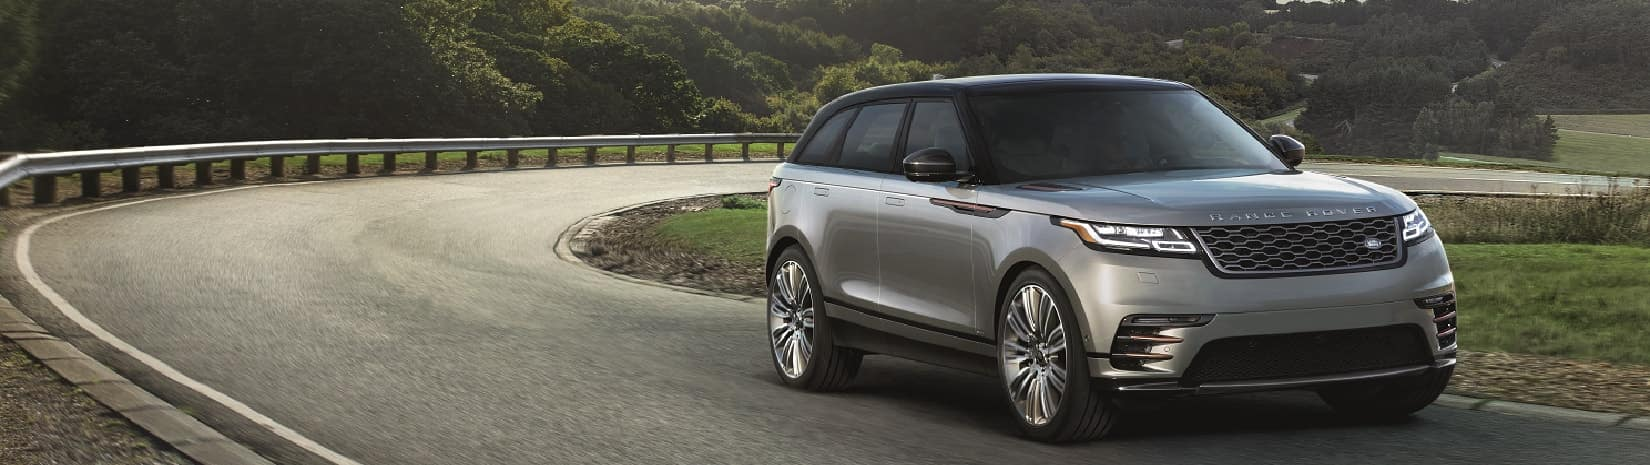 2018 Range Rover Velar Luxurious Interior